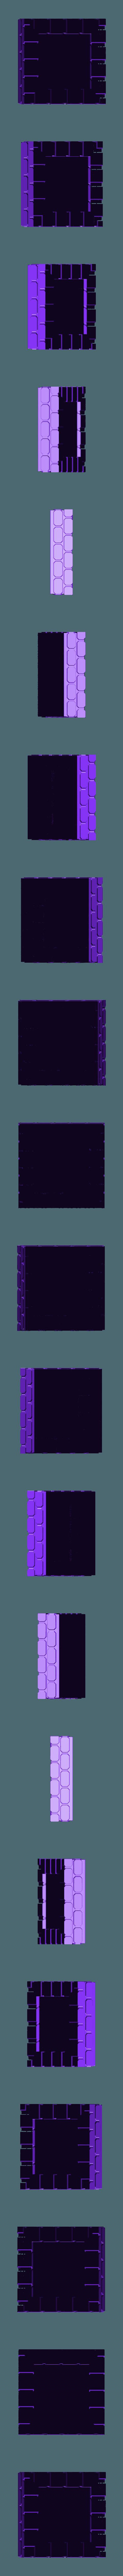 Finalized_Block.stl Download STL file GeneriTiles - Tabletop RPG Tileset • 3D printable object, daandruff